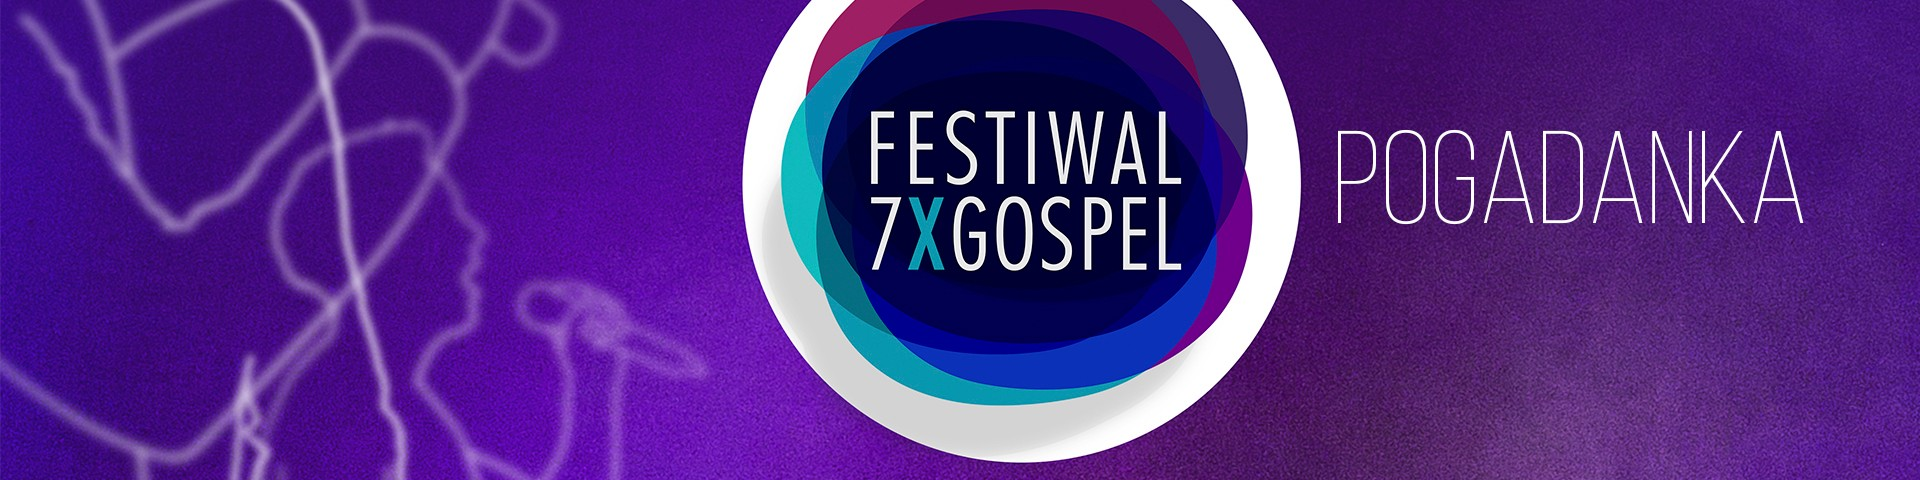 "7xGospel - ""Pogadanka Gospel"" w Louis Music Club"